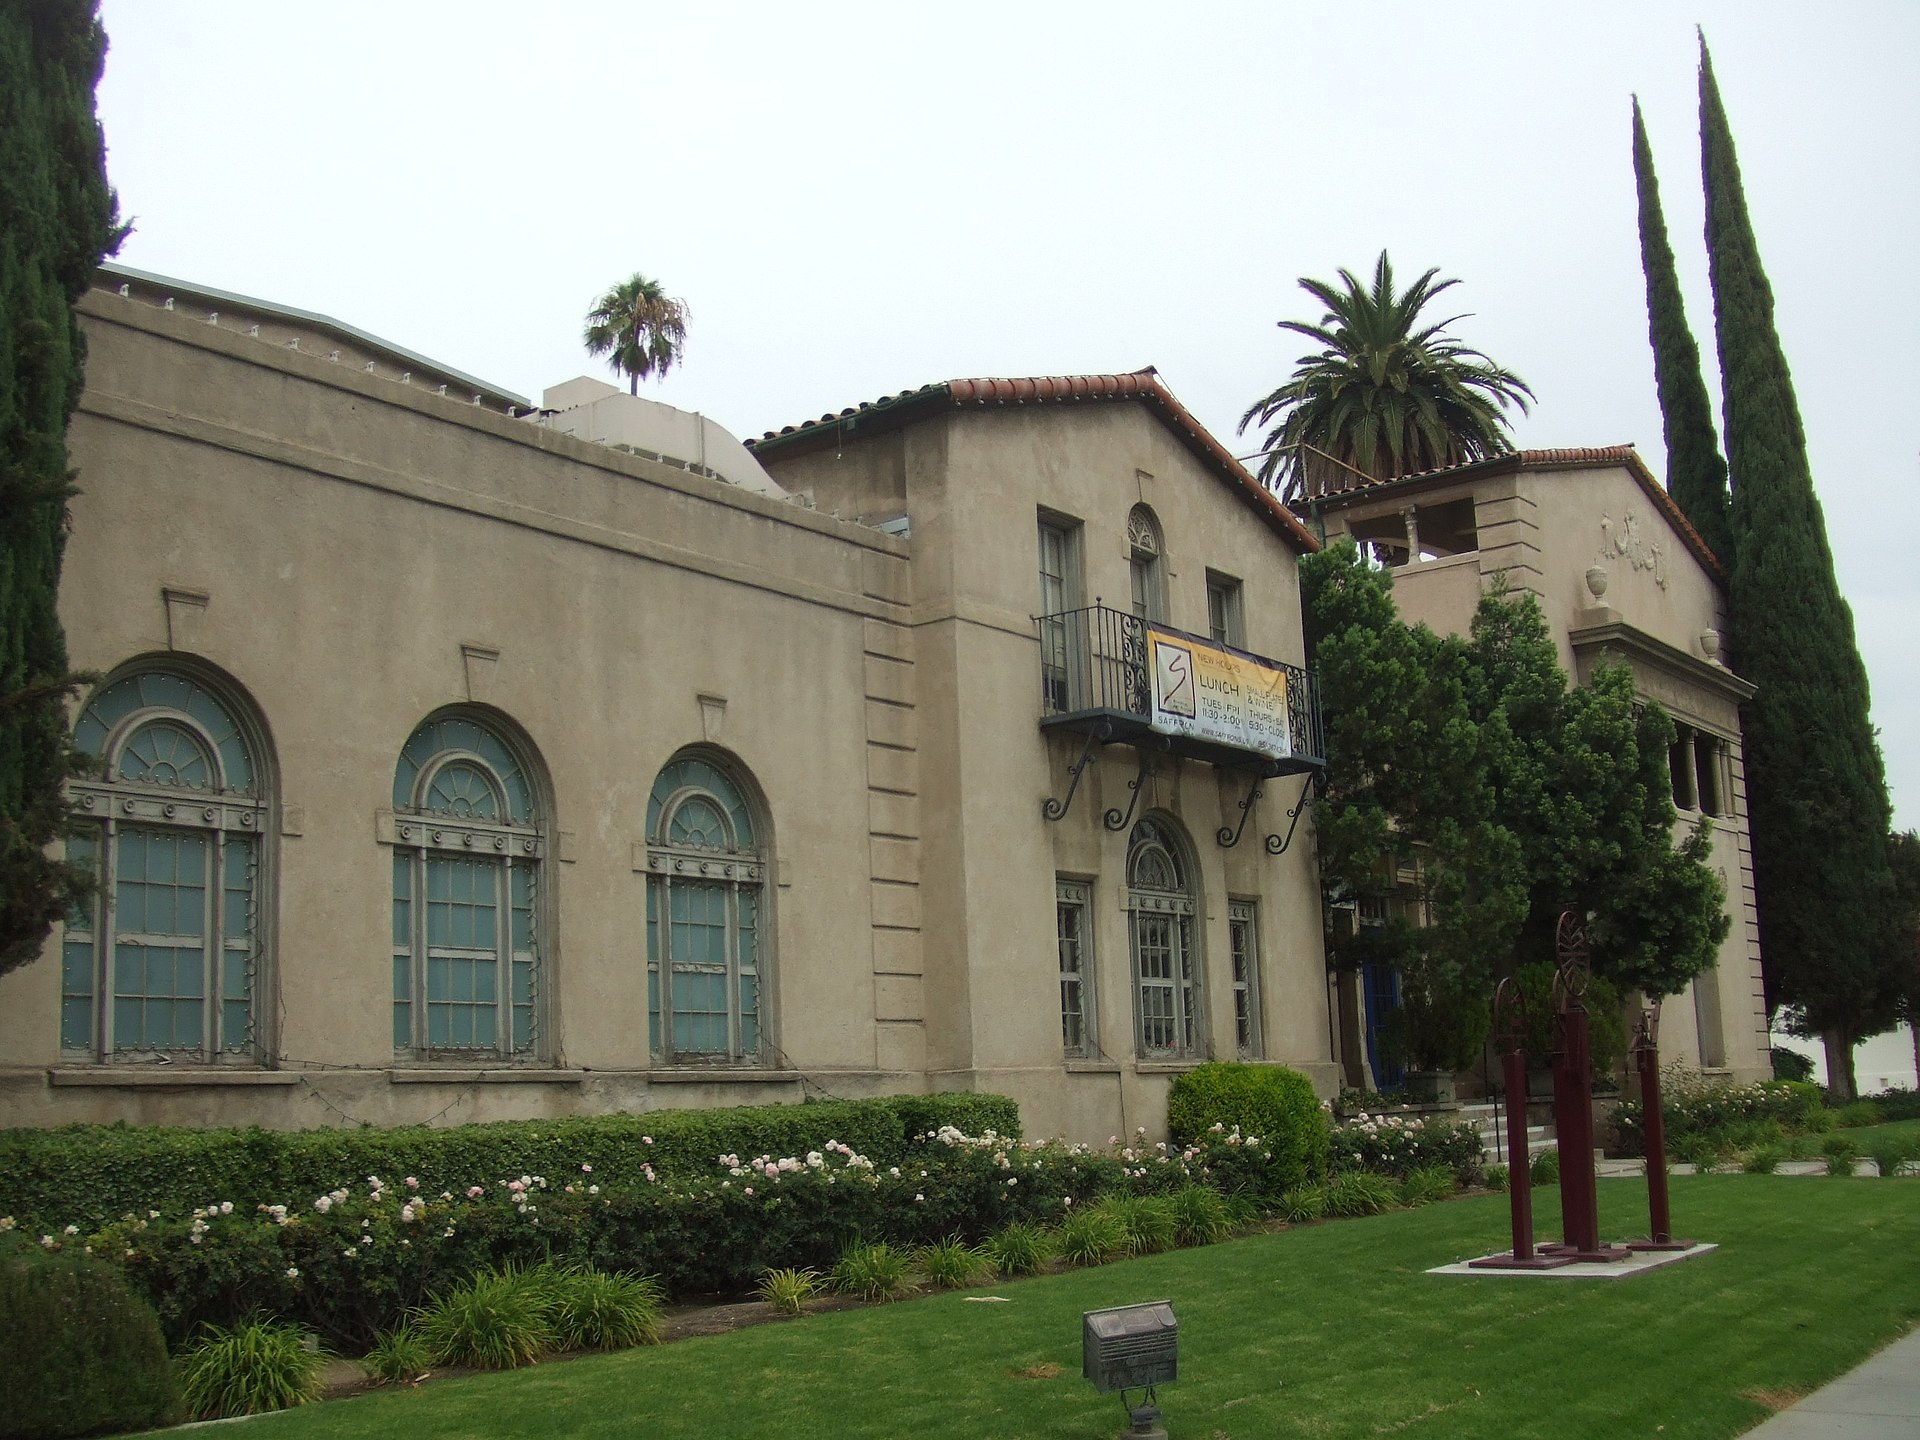 Riverside art museum wikipedia for The riverside